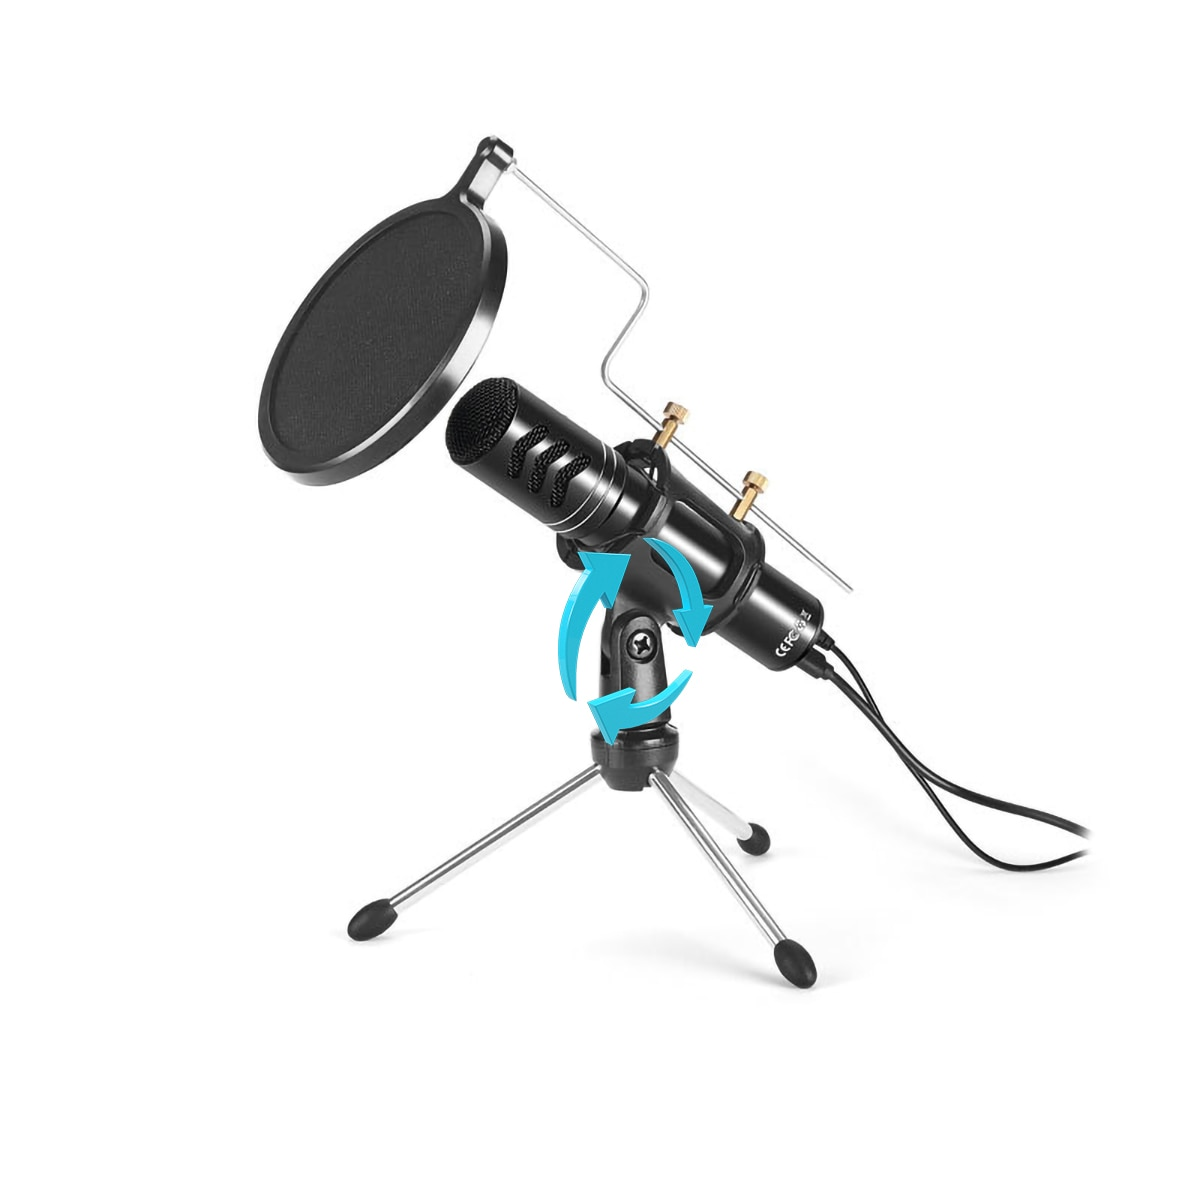 Micrófono condensador para grabación, micrófono con controlador gratuito, con tarjeta de sonido para ordenador portátil, juego en línea, transmisión por voz